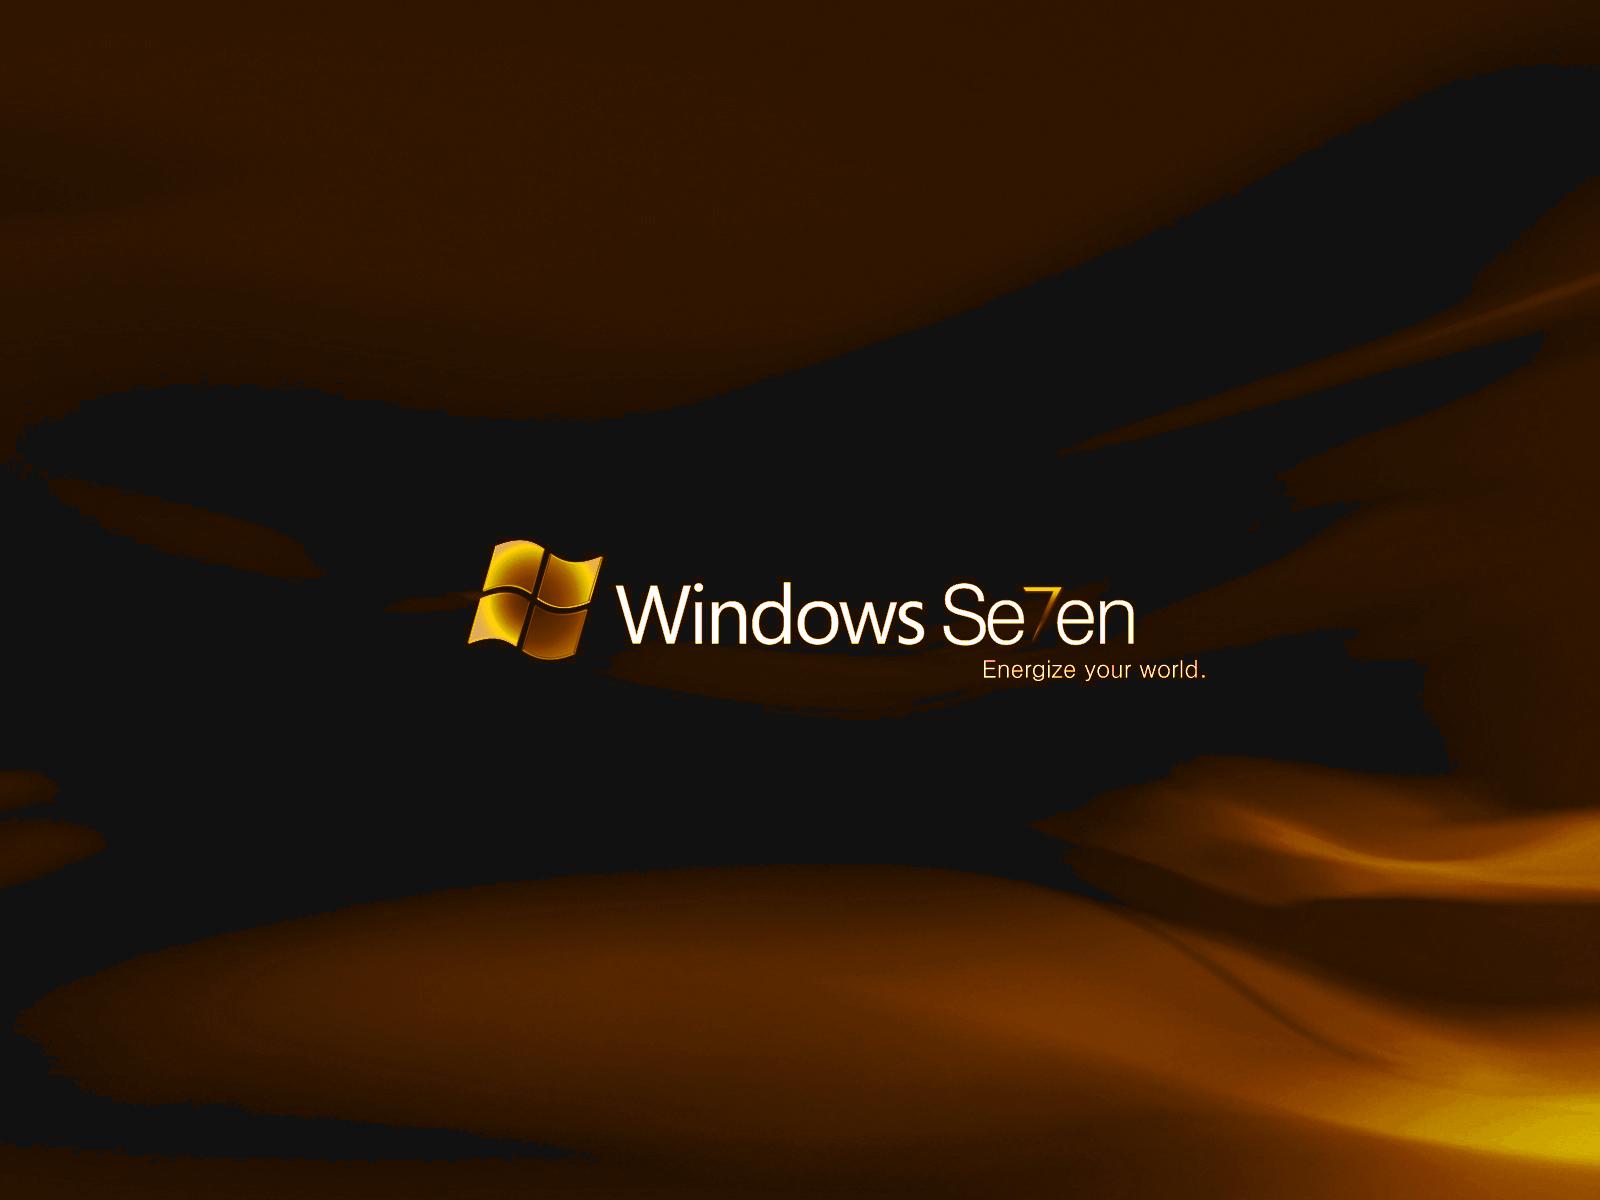 windows 7 wallpaper 2 windows 7 energize by windows jagodunya hd 1600x1200